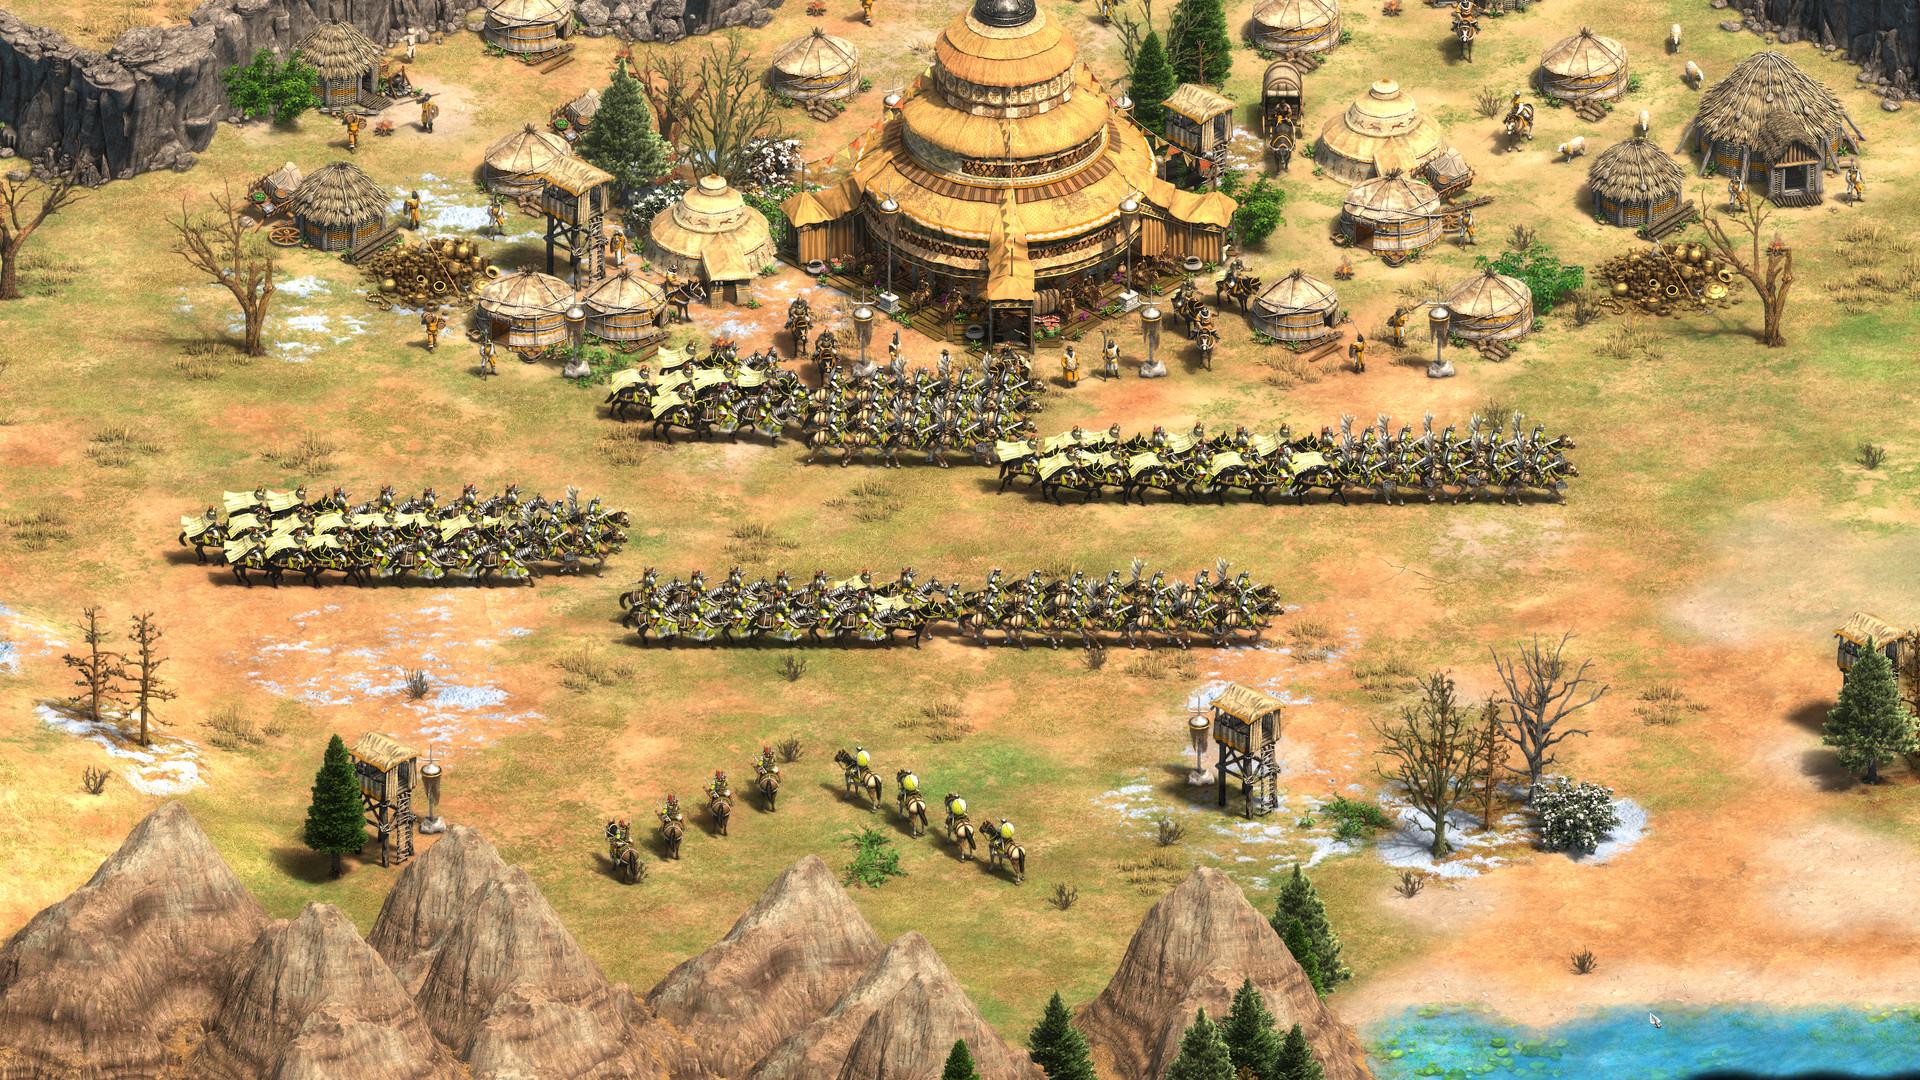 帝国时代2:决定版/终极版/20周年纪念版/Age of Empires II: Definitive Edition